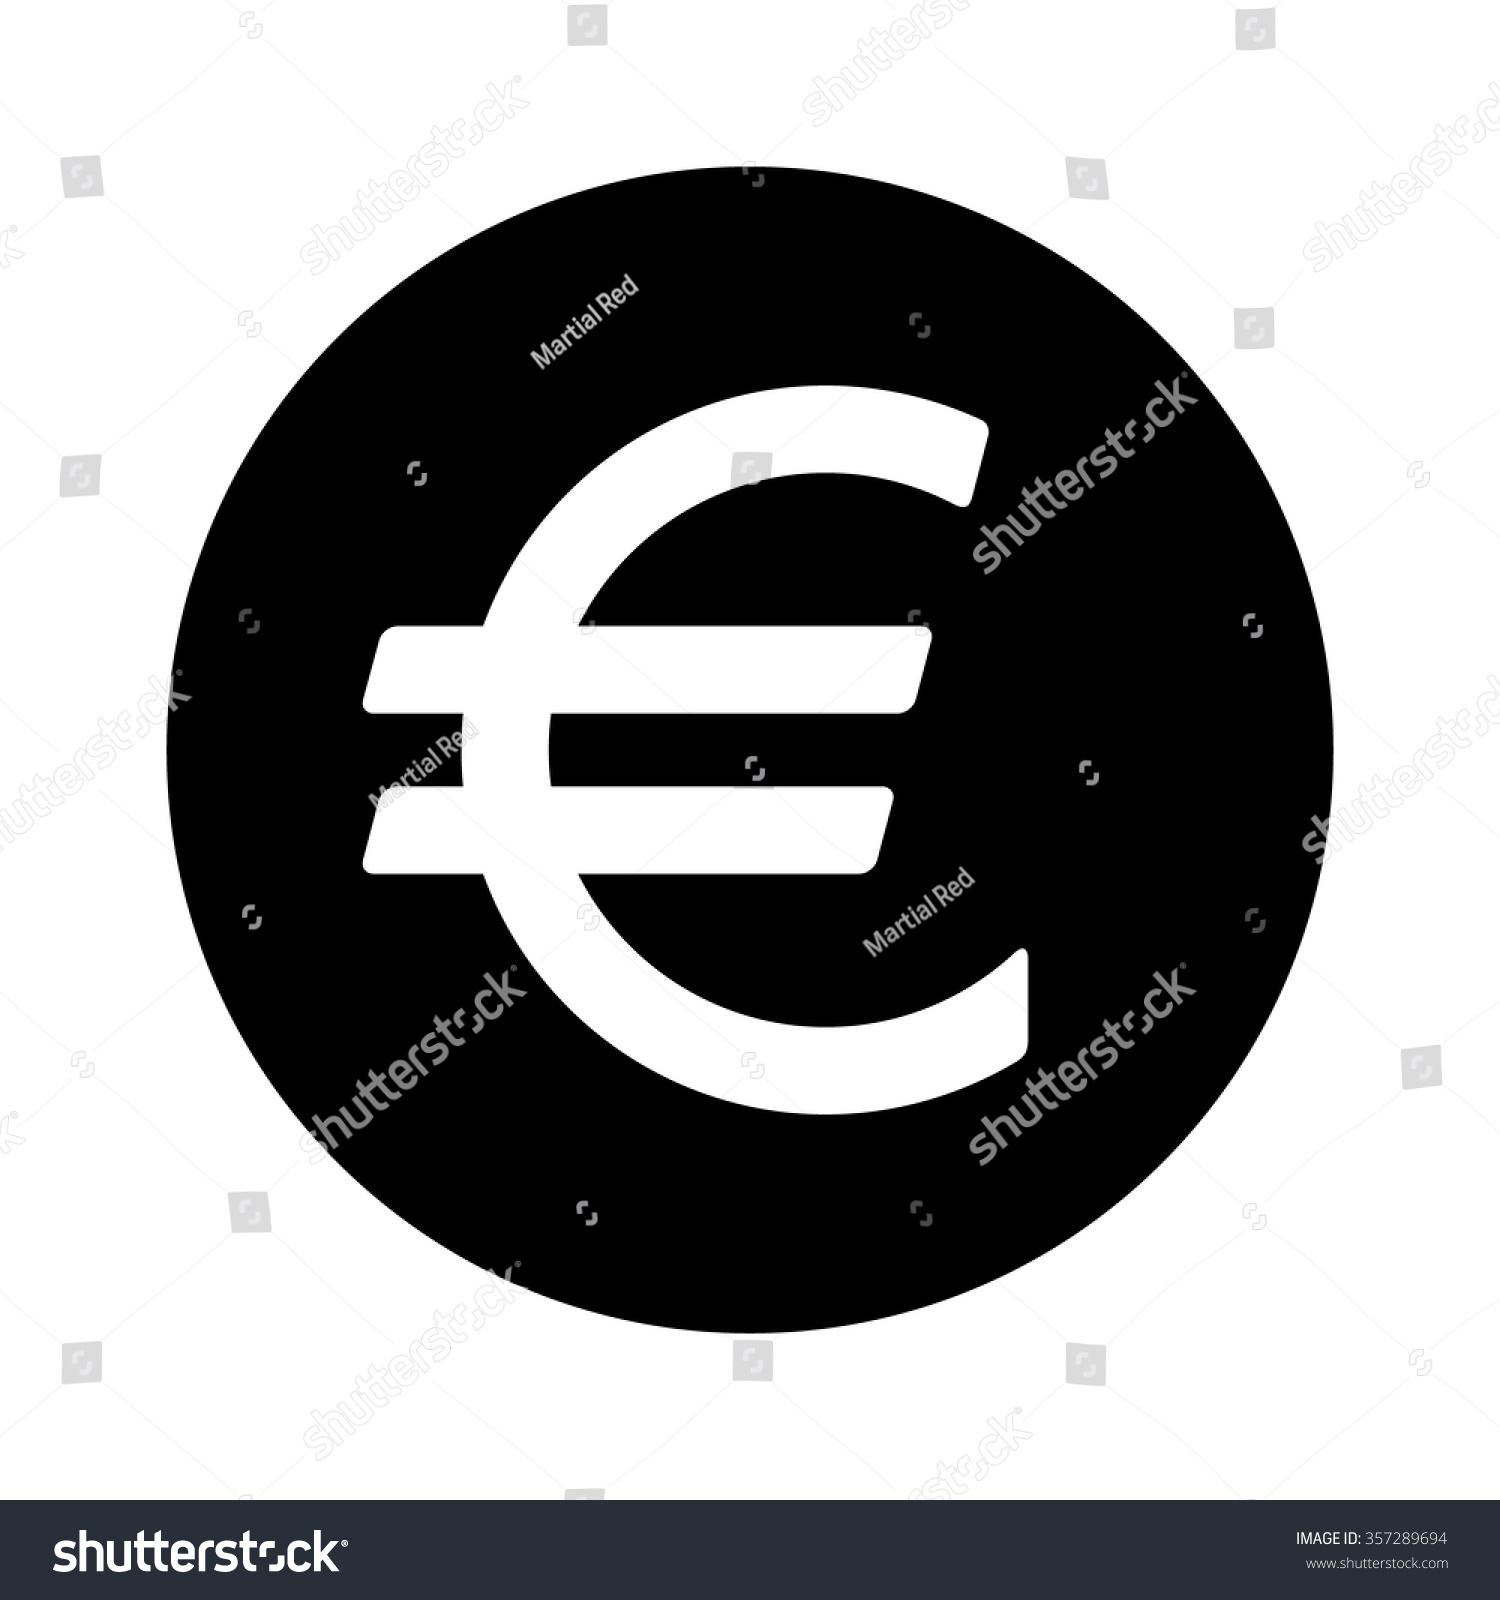 European euro currency symbol flat icon stock vector 357289694 european euro currency symbol flat icon for apps and websites buycottarizona Choice Image